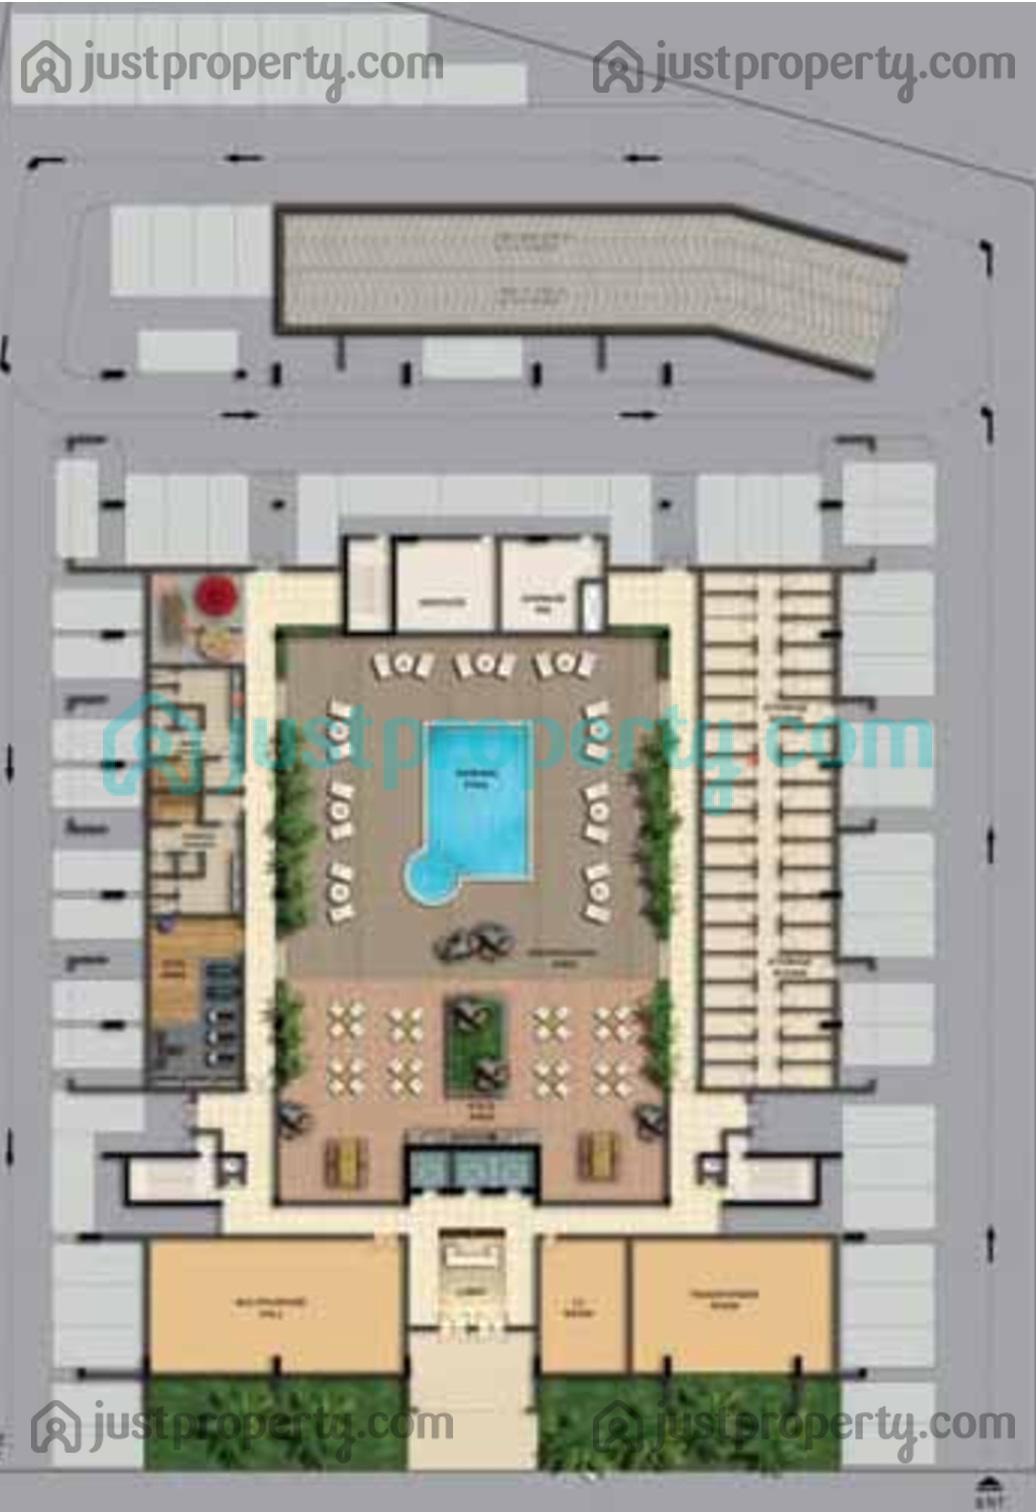 Coral Residence Floor Plans Justproperty Com